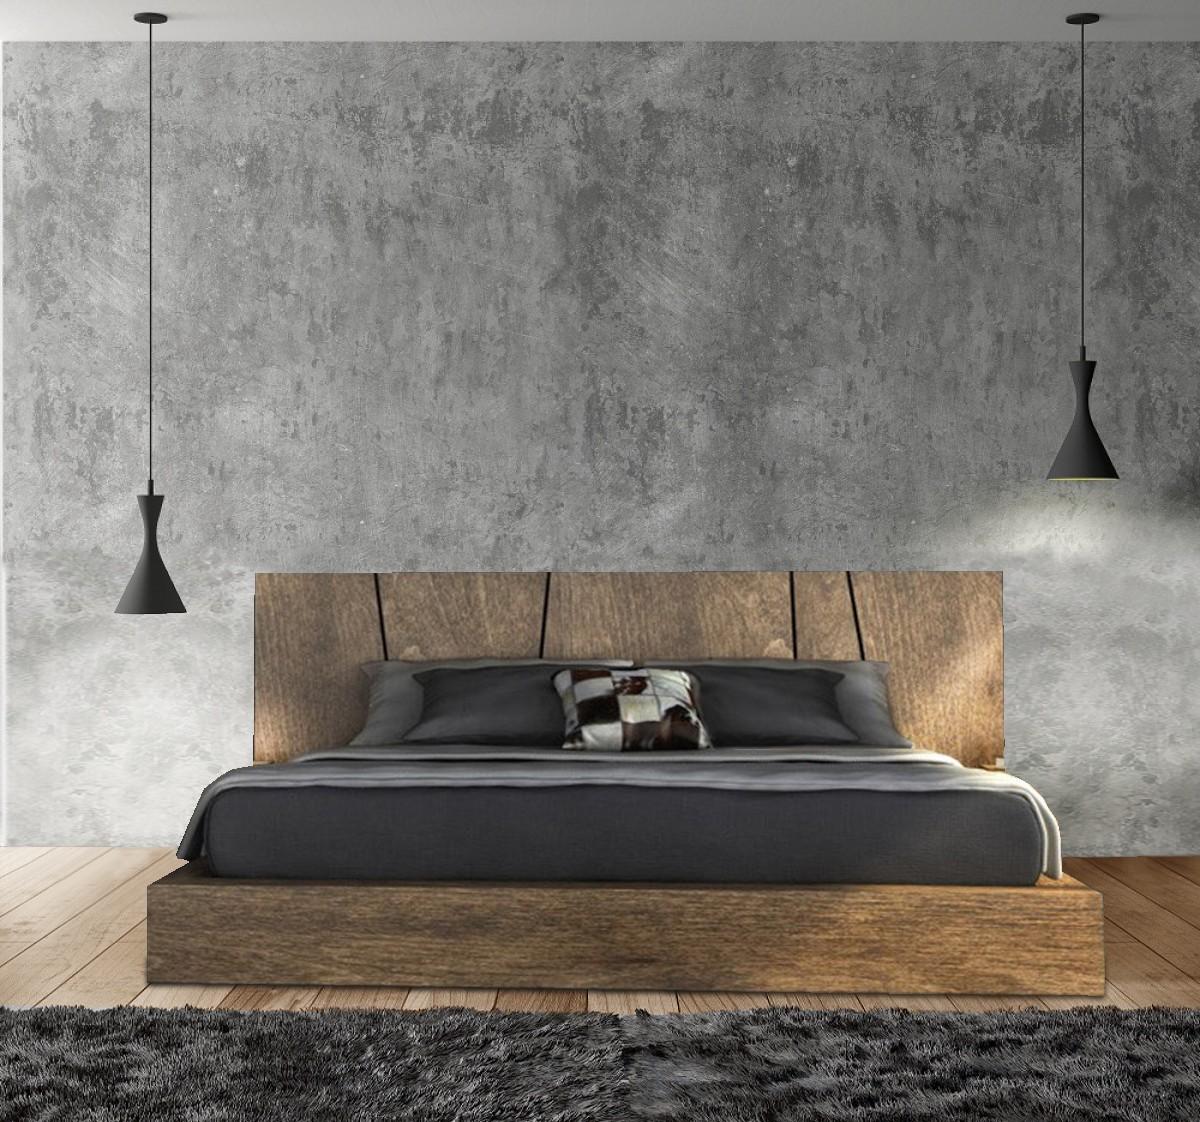 Oregon Luxury Wooden Bed Bespoke Bed Hadley Rose